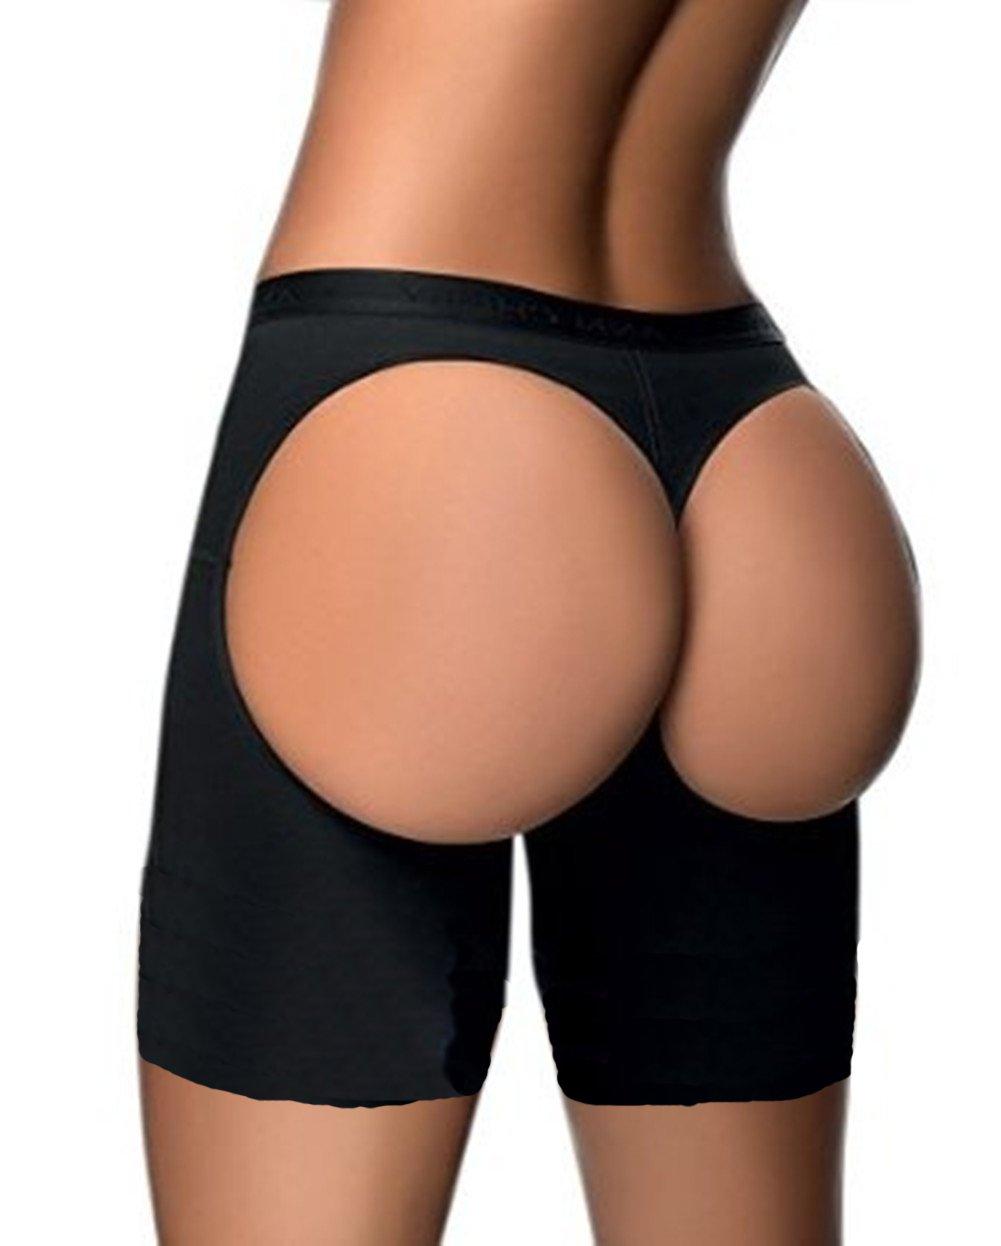 295183a0bb HOLYSNOW Women Apple Bottom Shapewear Butt Lifter Thigh Slimmer Control  Panty